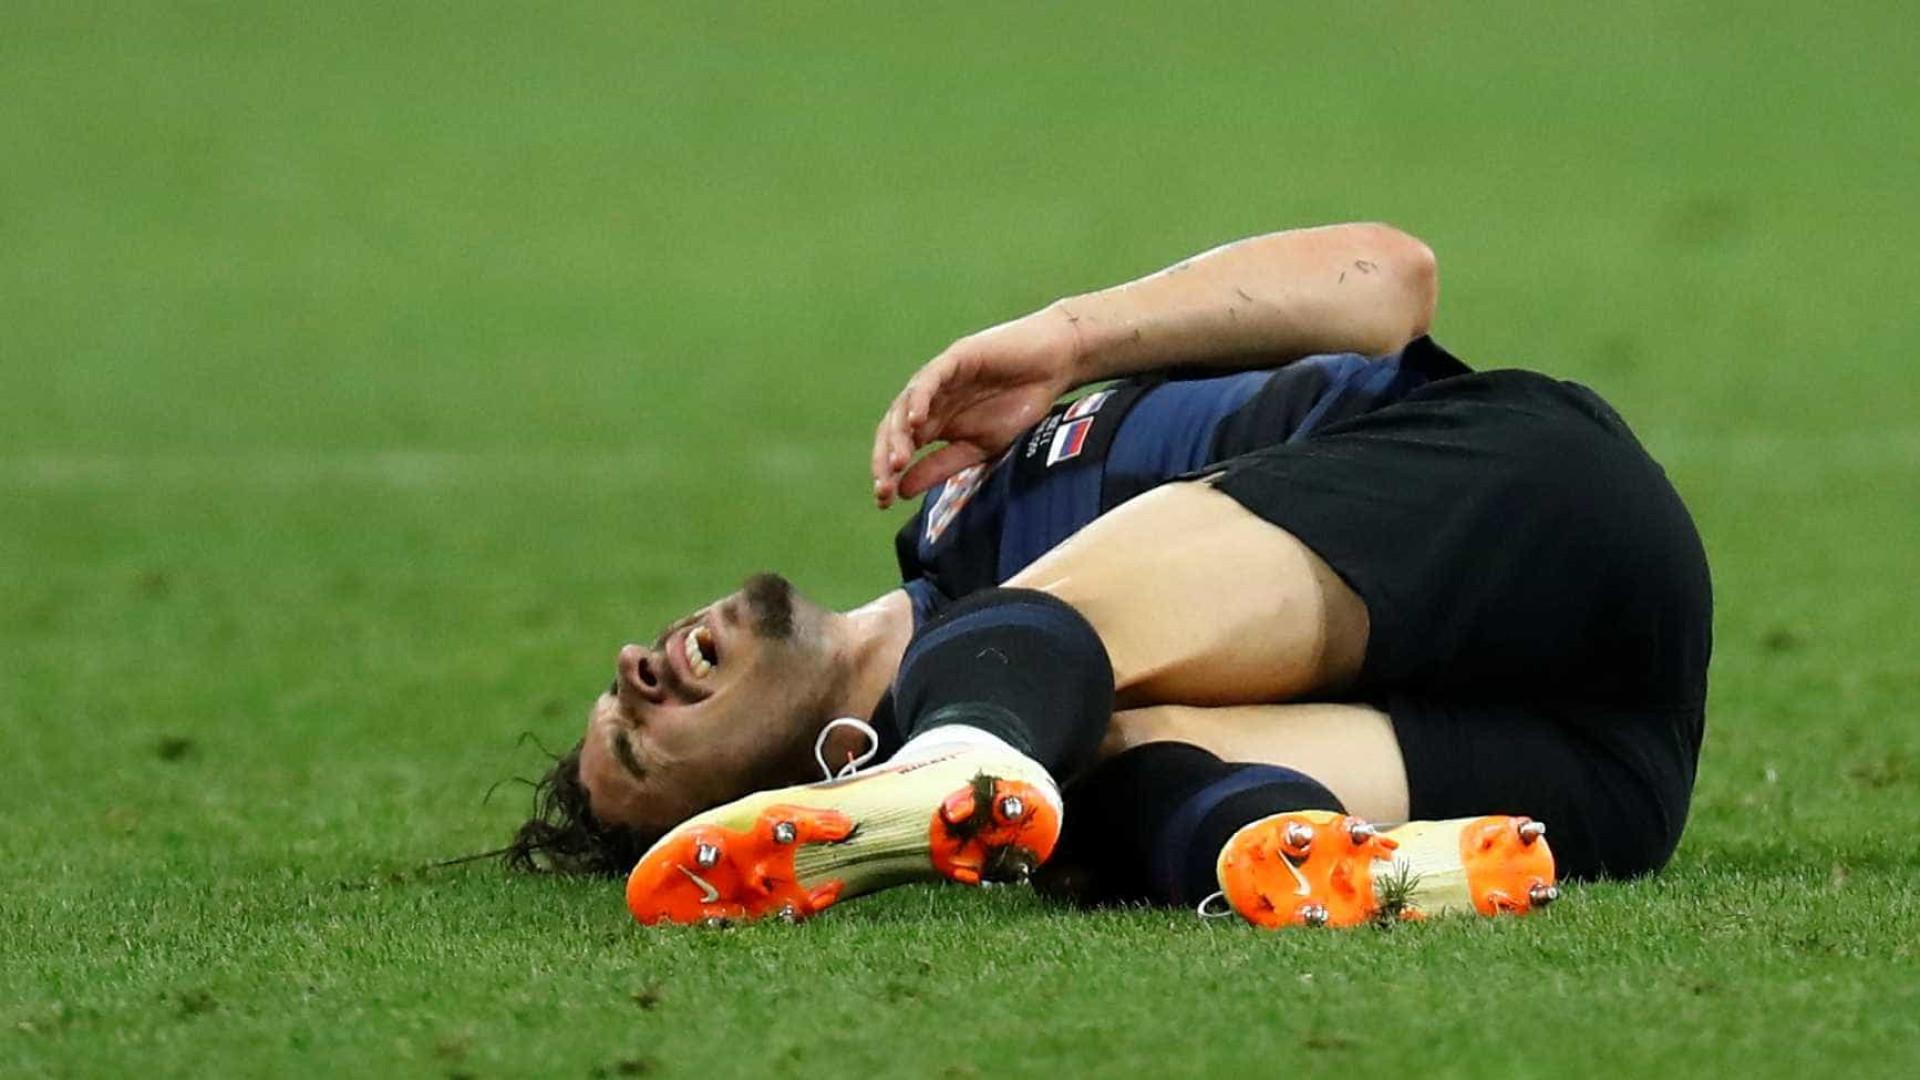 Croácia perde lateral direito e goleiro é dúvida para semi